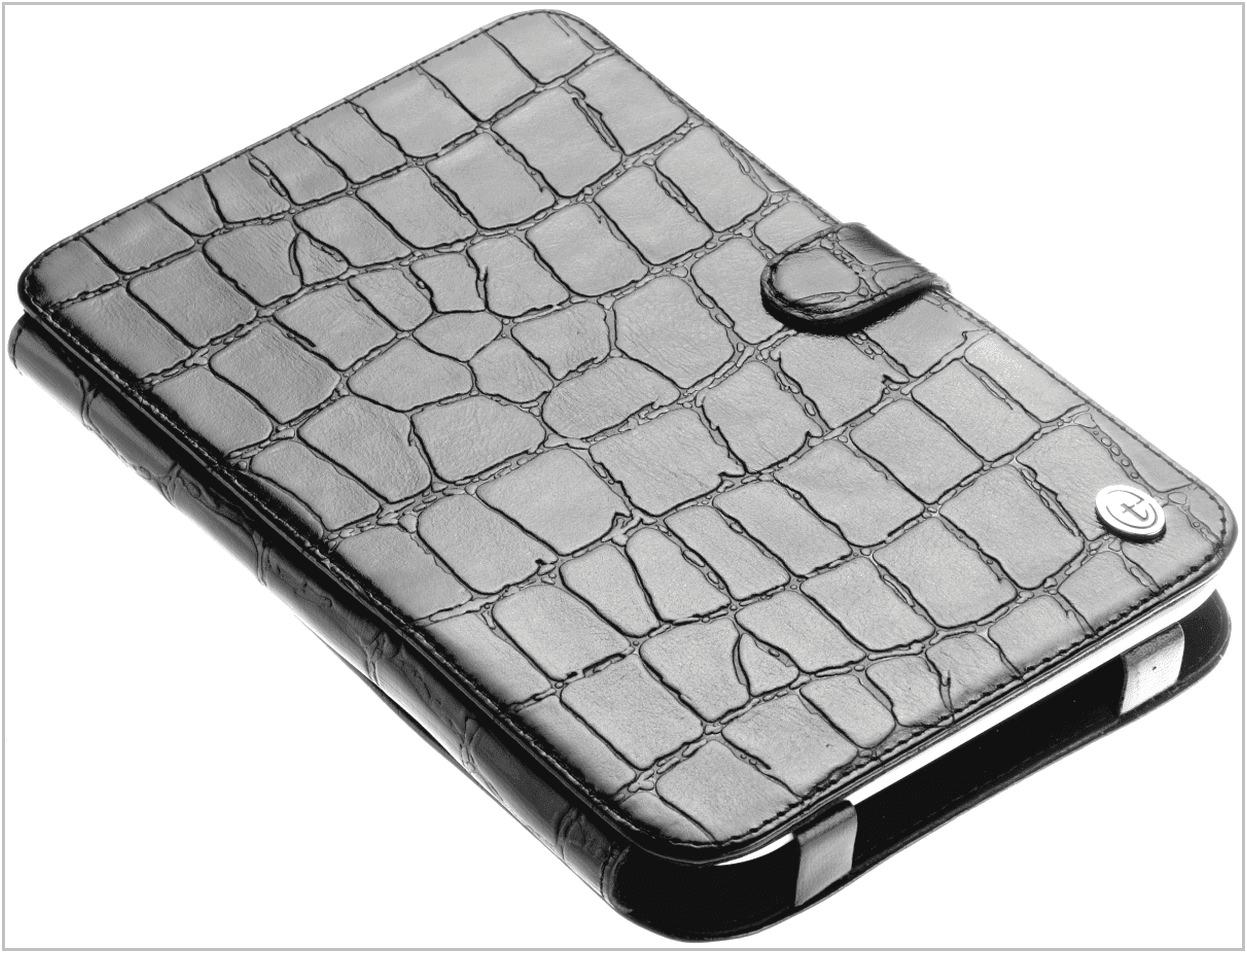 Чехол-обложка для PocketBook 613 Basic New Time размер с крокодил